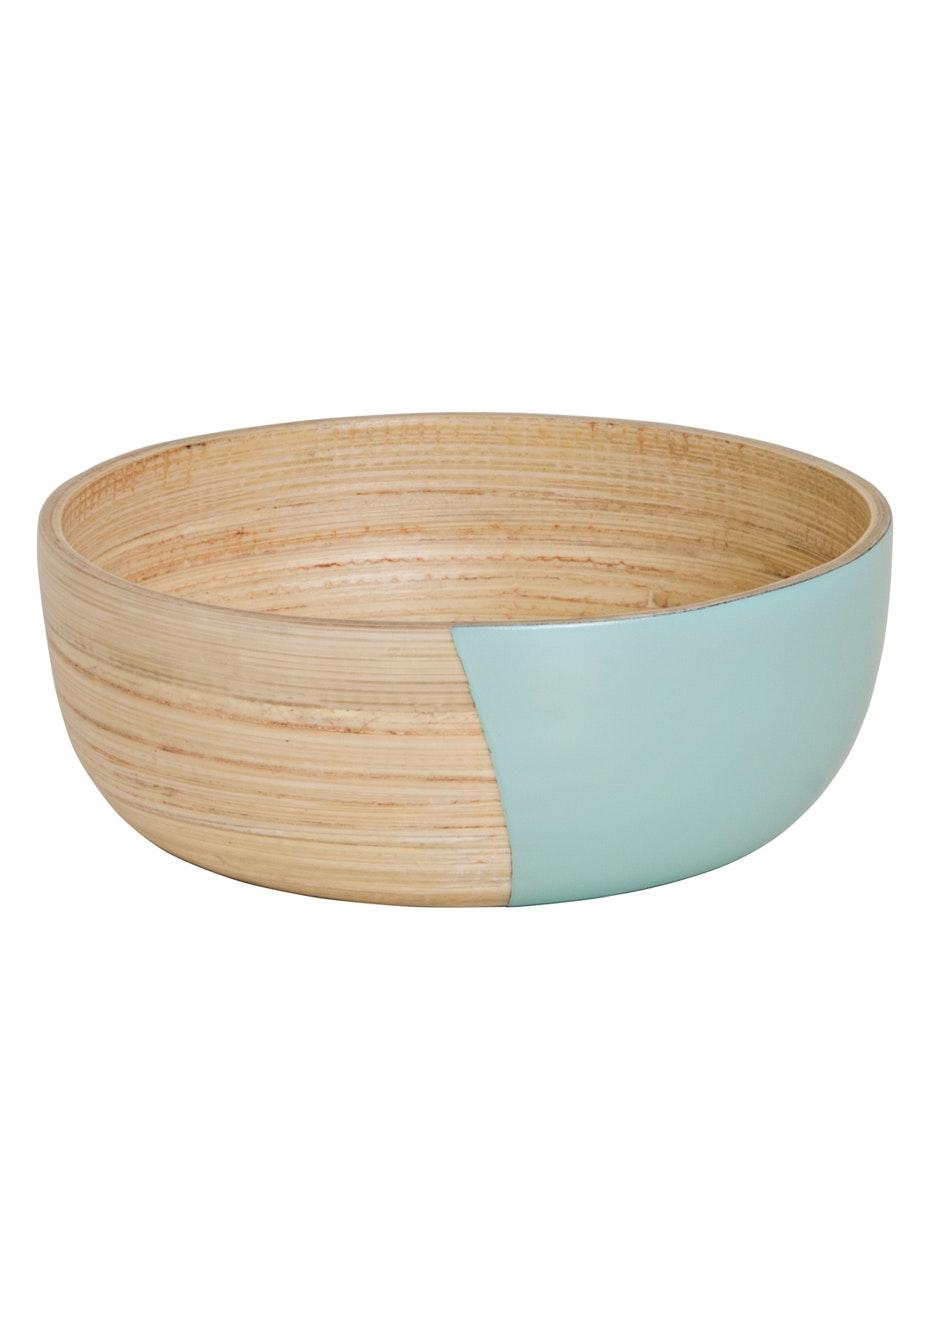 Wooden Bowls - Mint/Wood